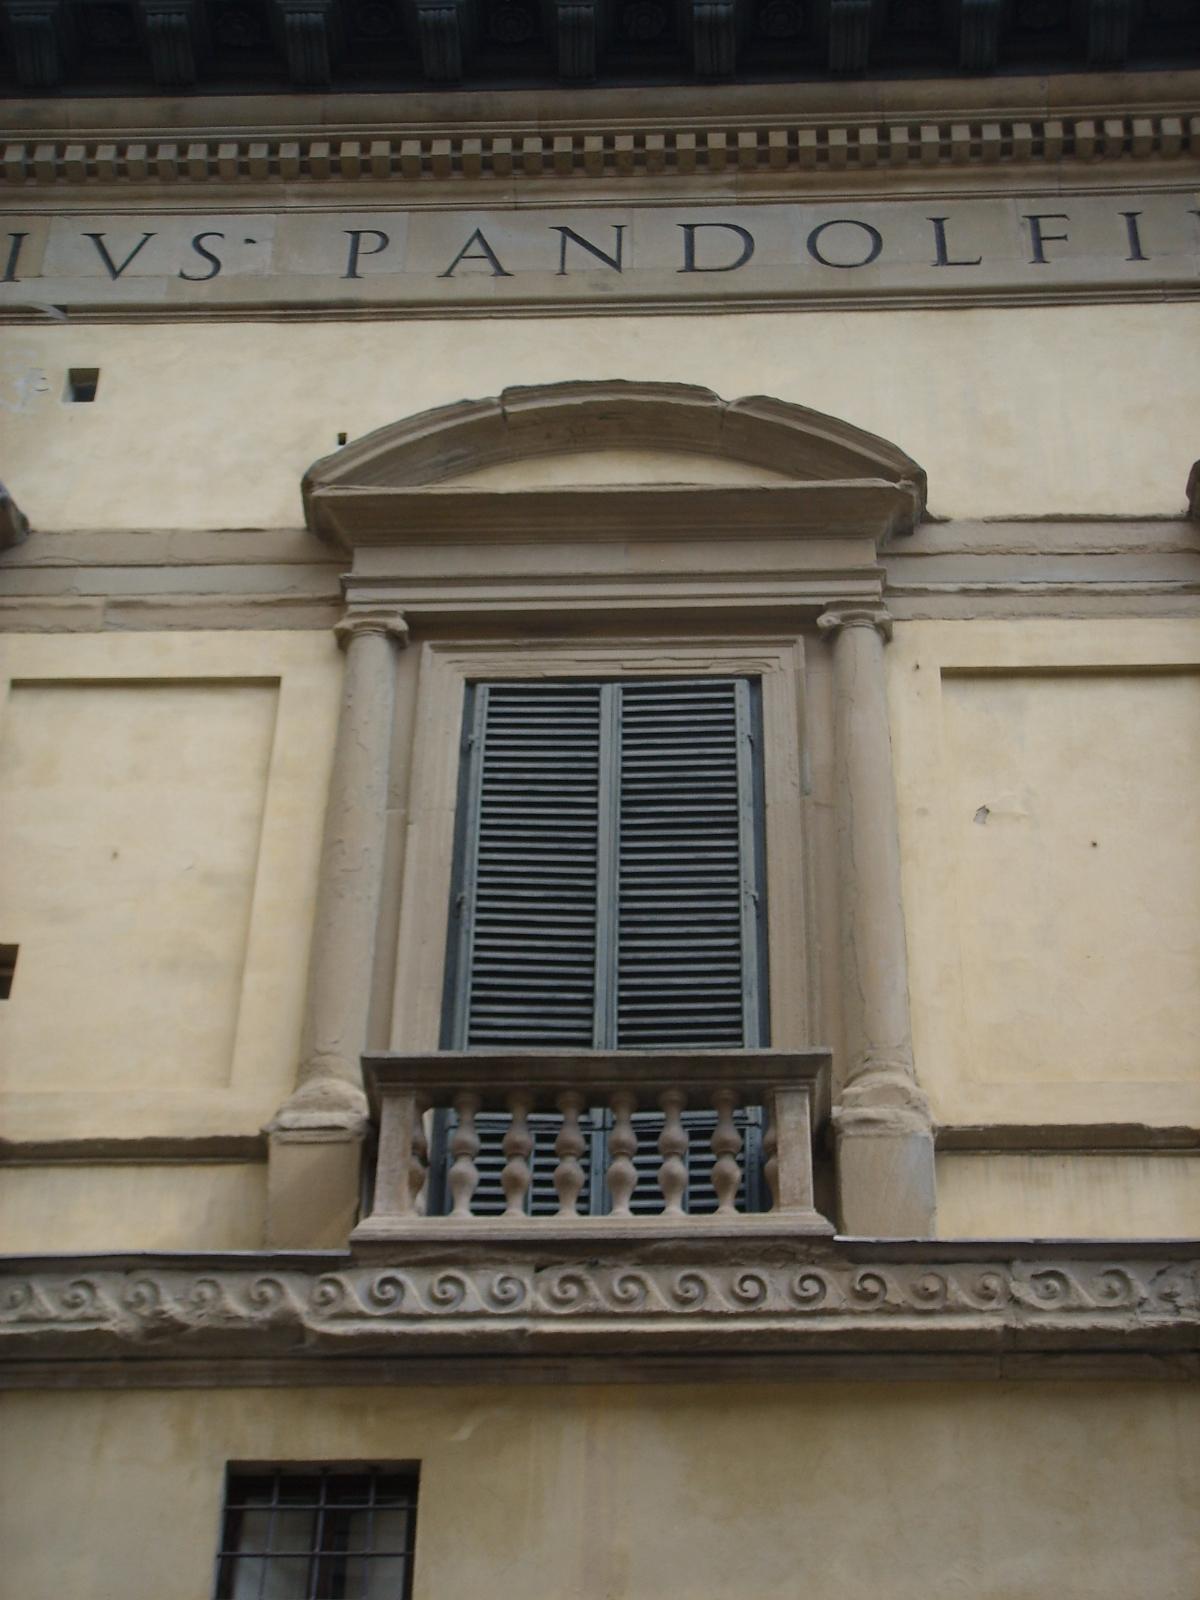 palazzo pandolfini florence italy designed between 1513 1514 by raphael construction begun. Black Bedroom Furniture Sets. Home Design Ideas